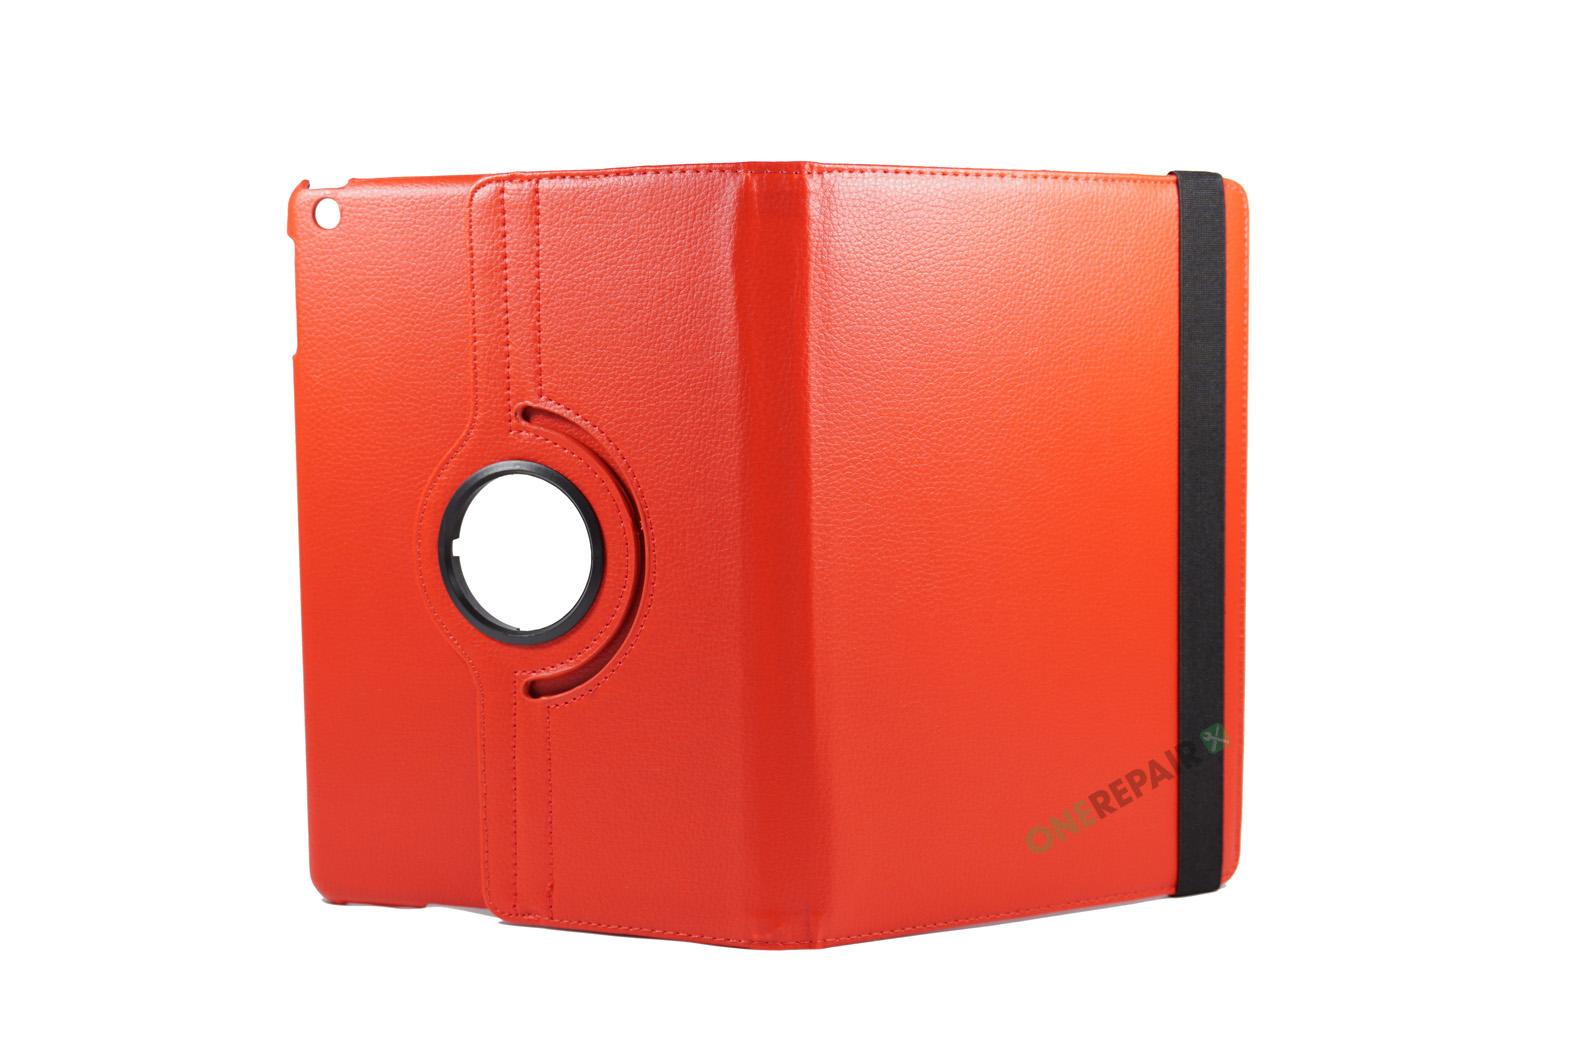 351016_iPad_Air_A1474_A1475_A1476_Flipcover_Cover_Roed_OneRepair_00004